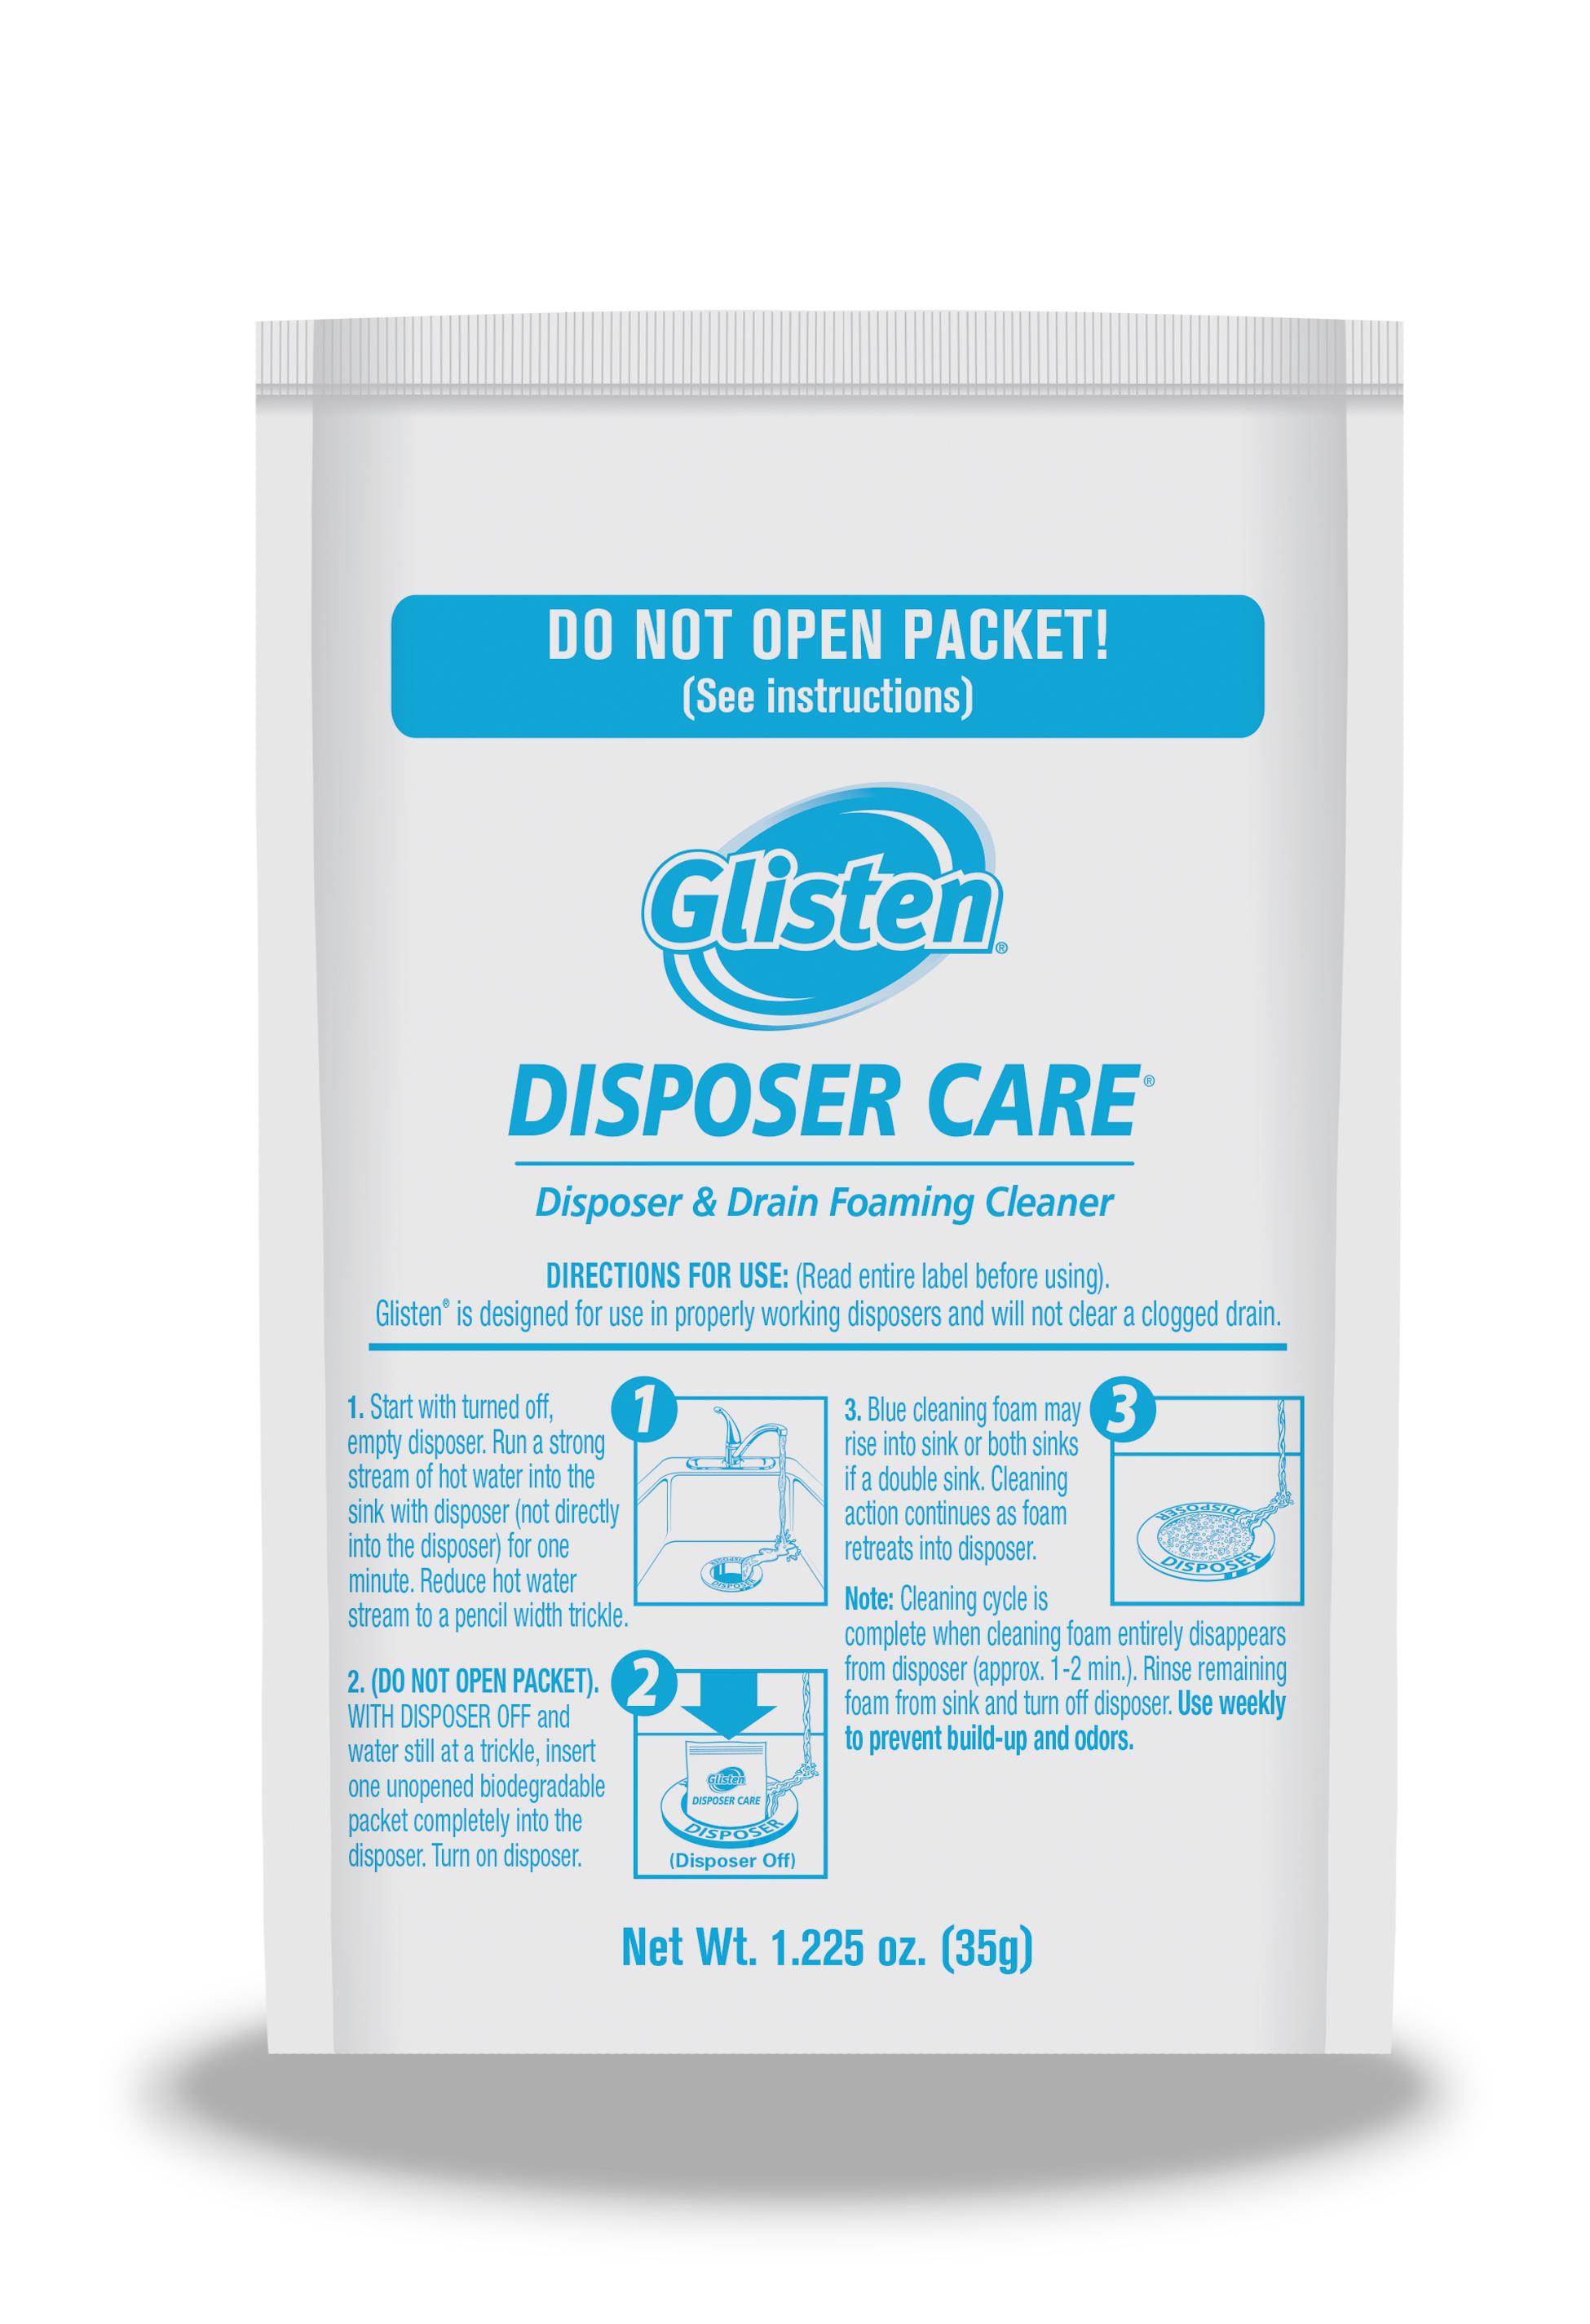 Glisten Disposer Care Cleaner, 4.9 OZ - Walmart.com